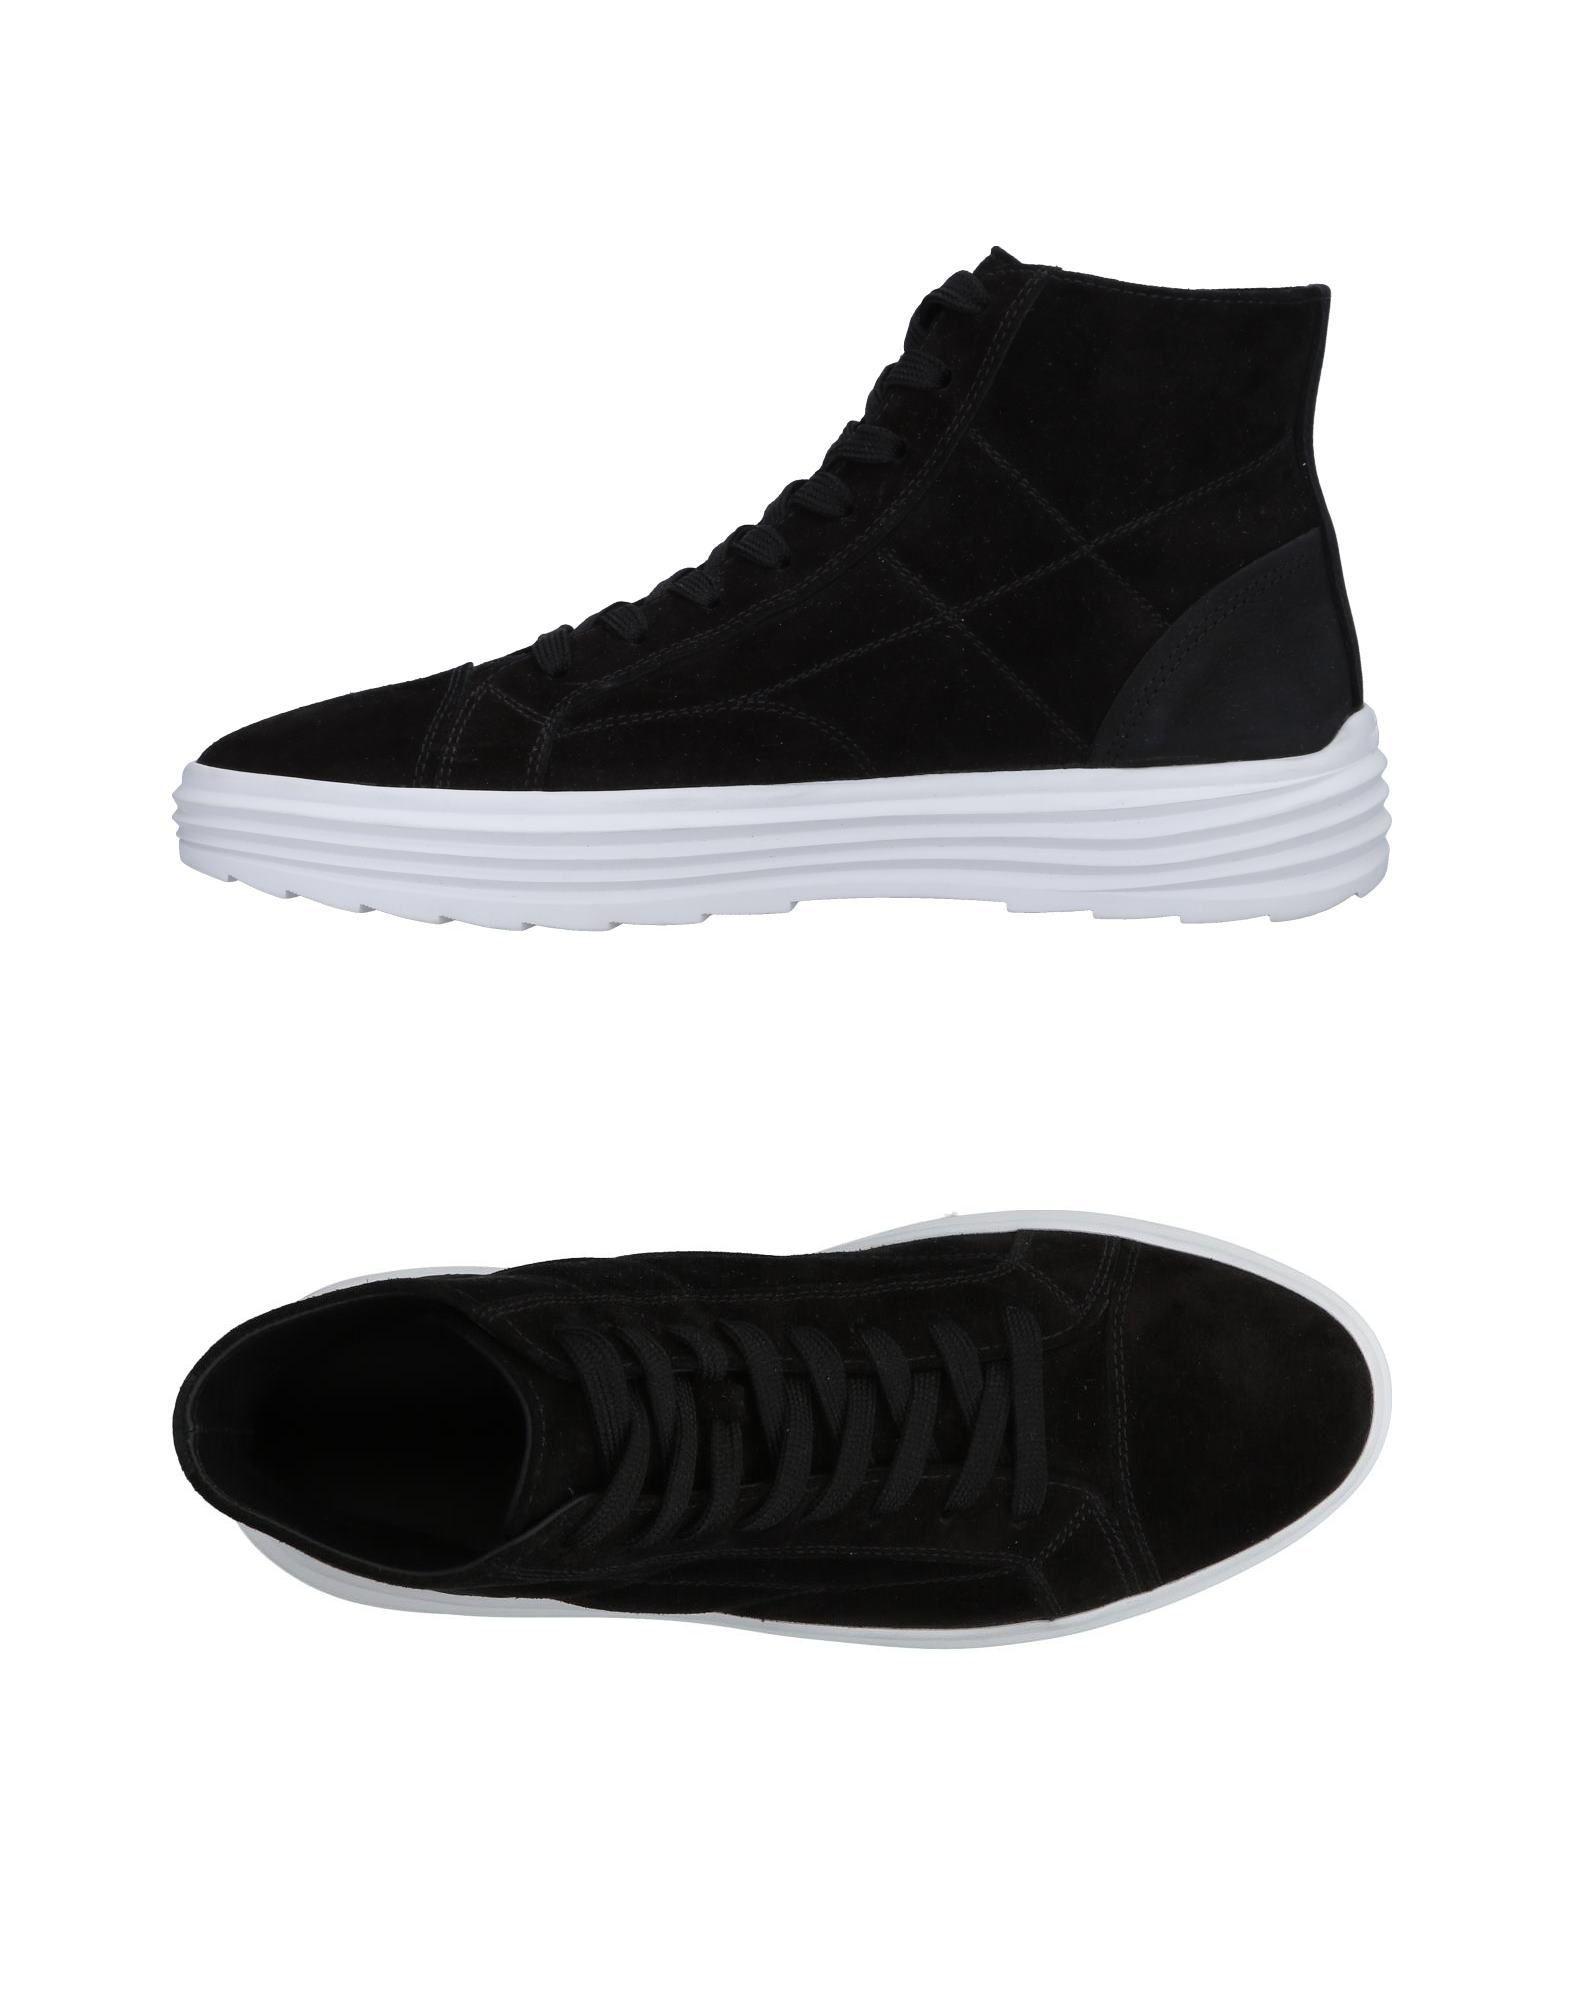 Hogan Sneakers Herren  11497110WW Gute Qualität beliebte Schuhe